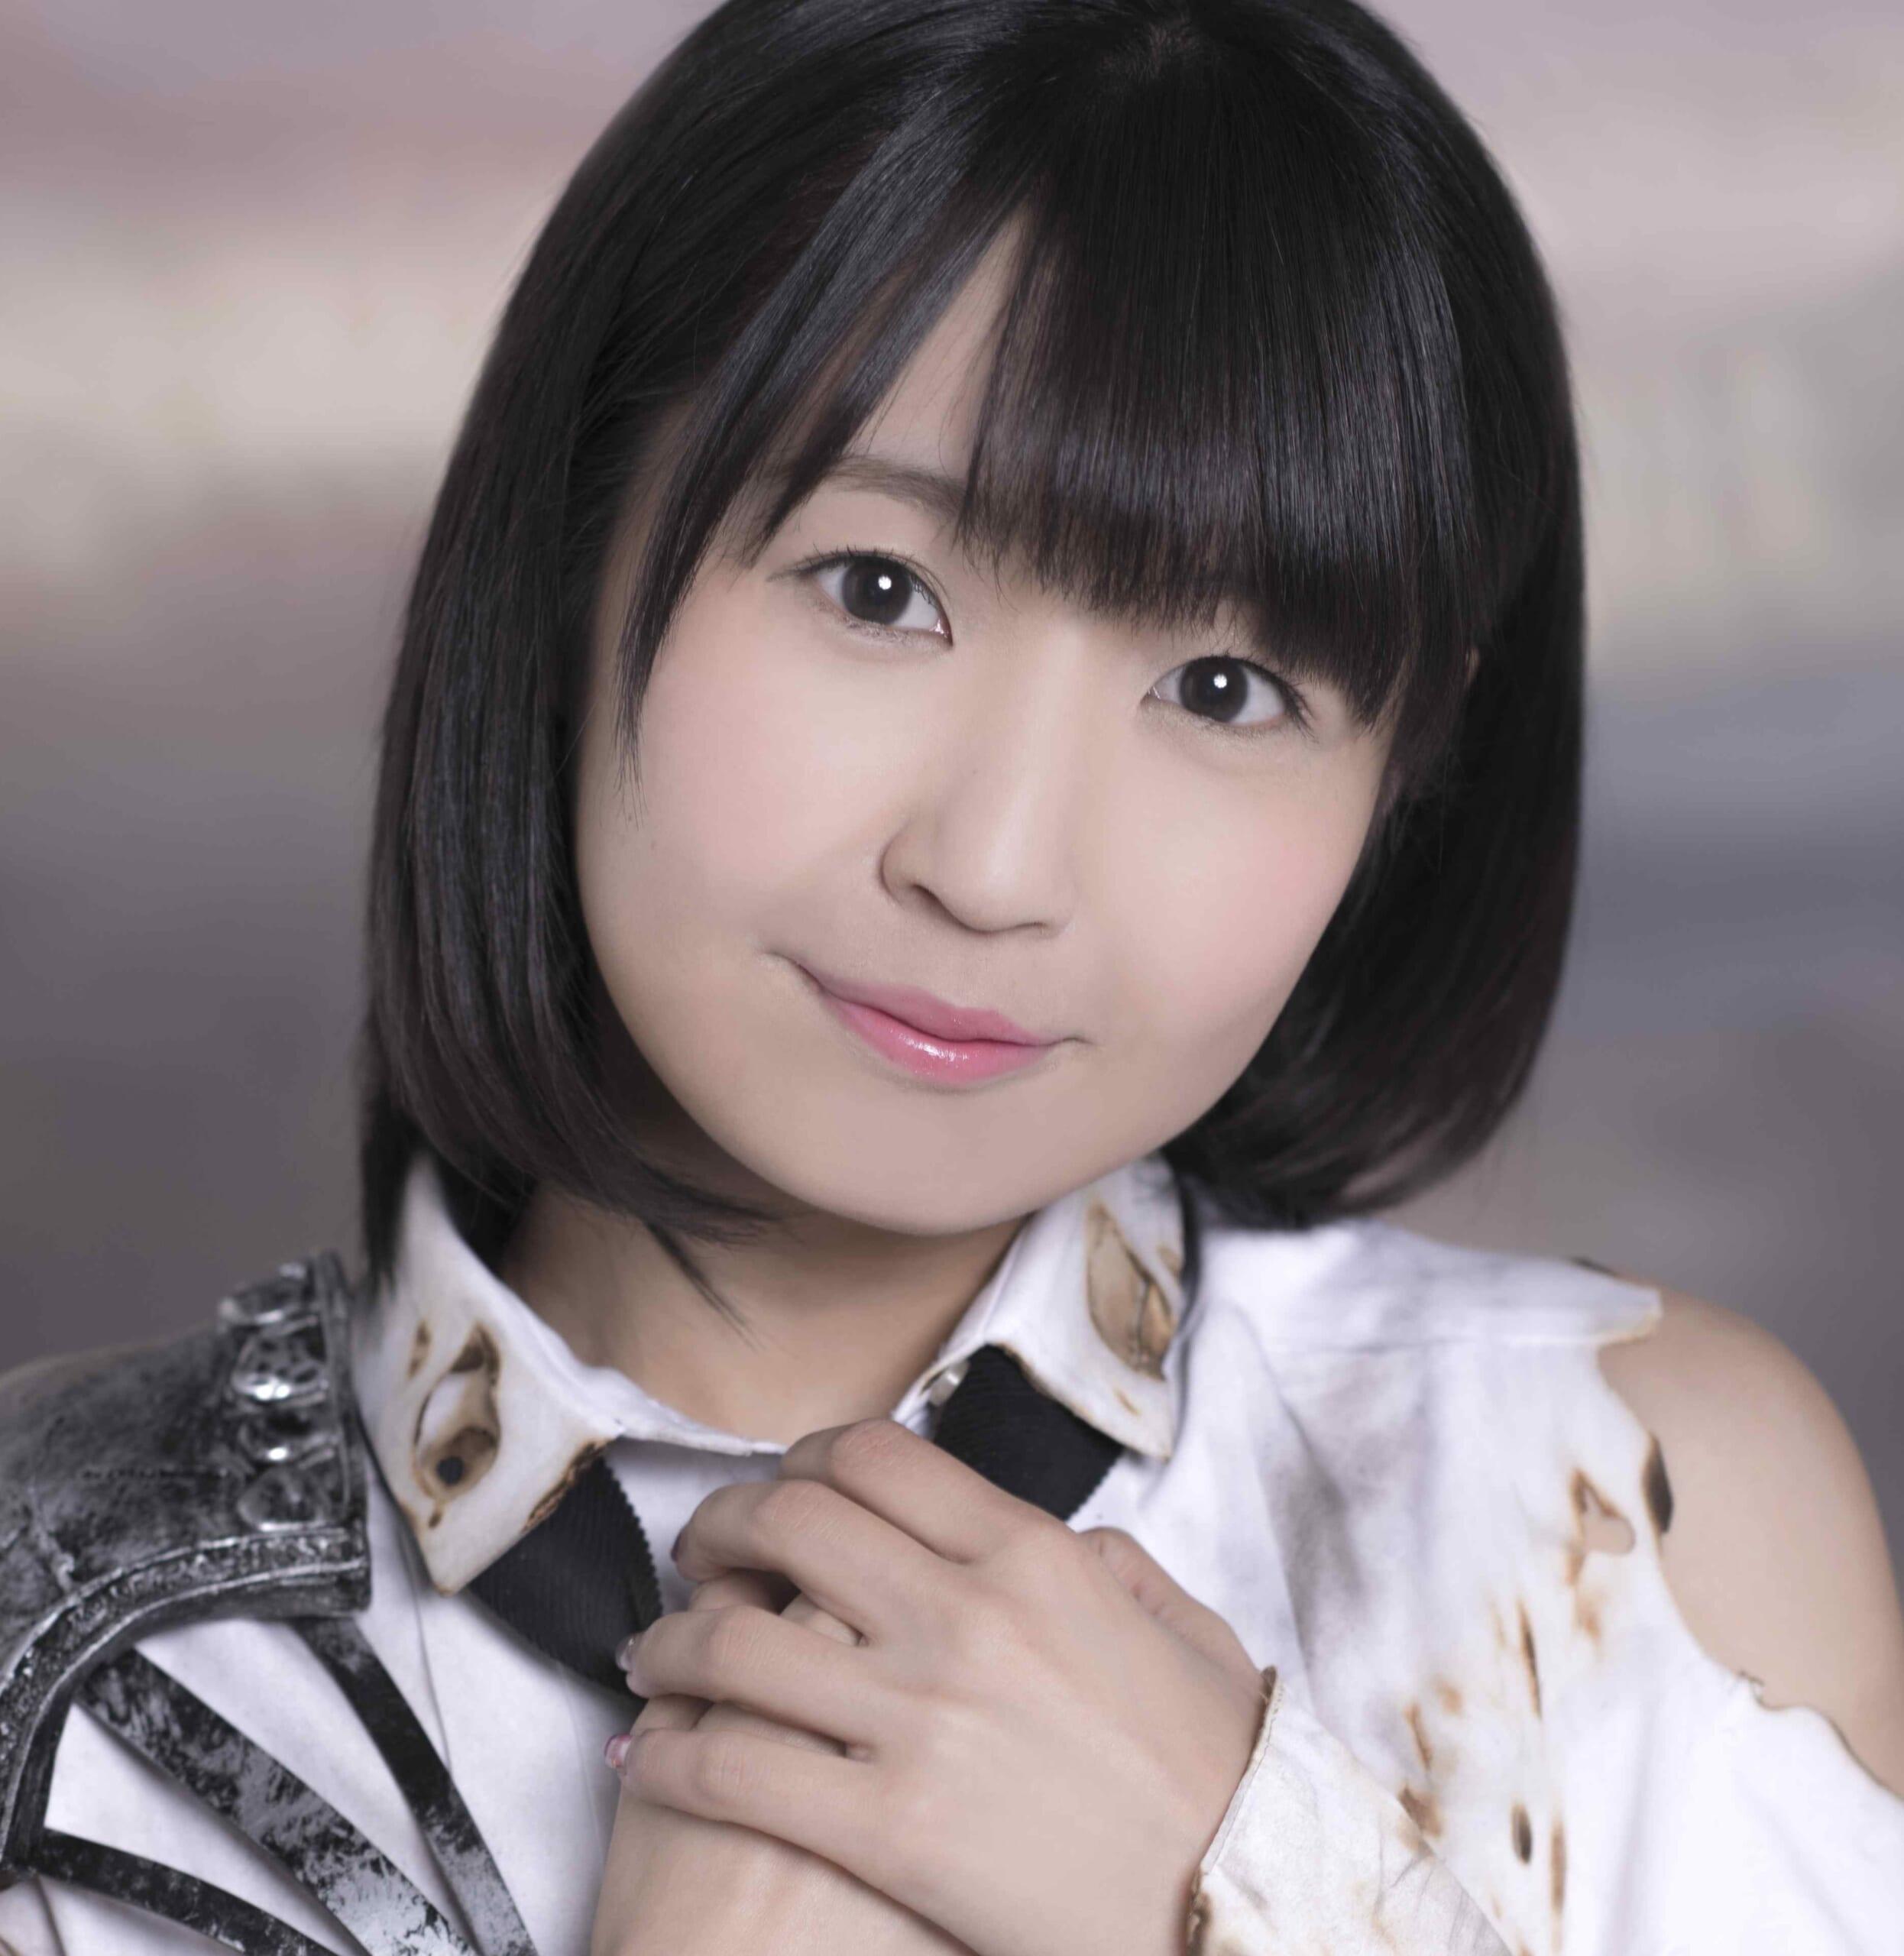 "SKE48惣田紗莉渚「""たまに、かわいい""って…(笑)」【「ガチ私服」抜き打ちチェック!】"